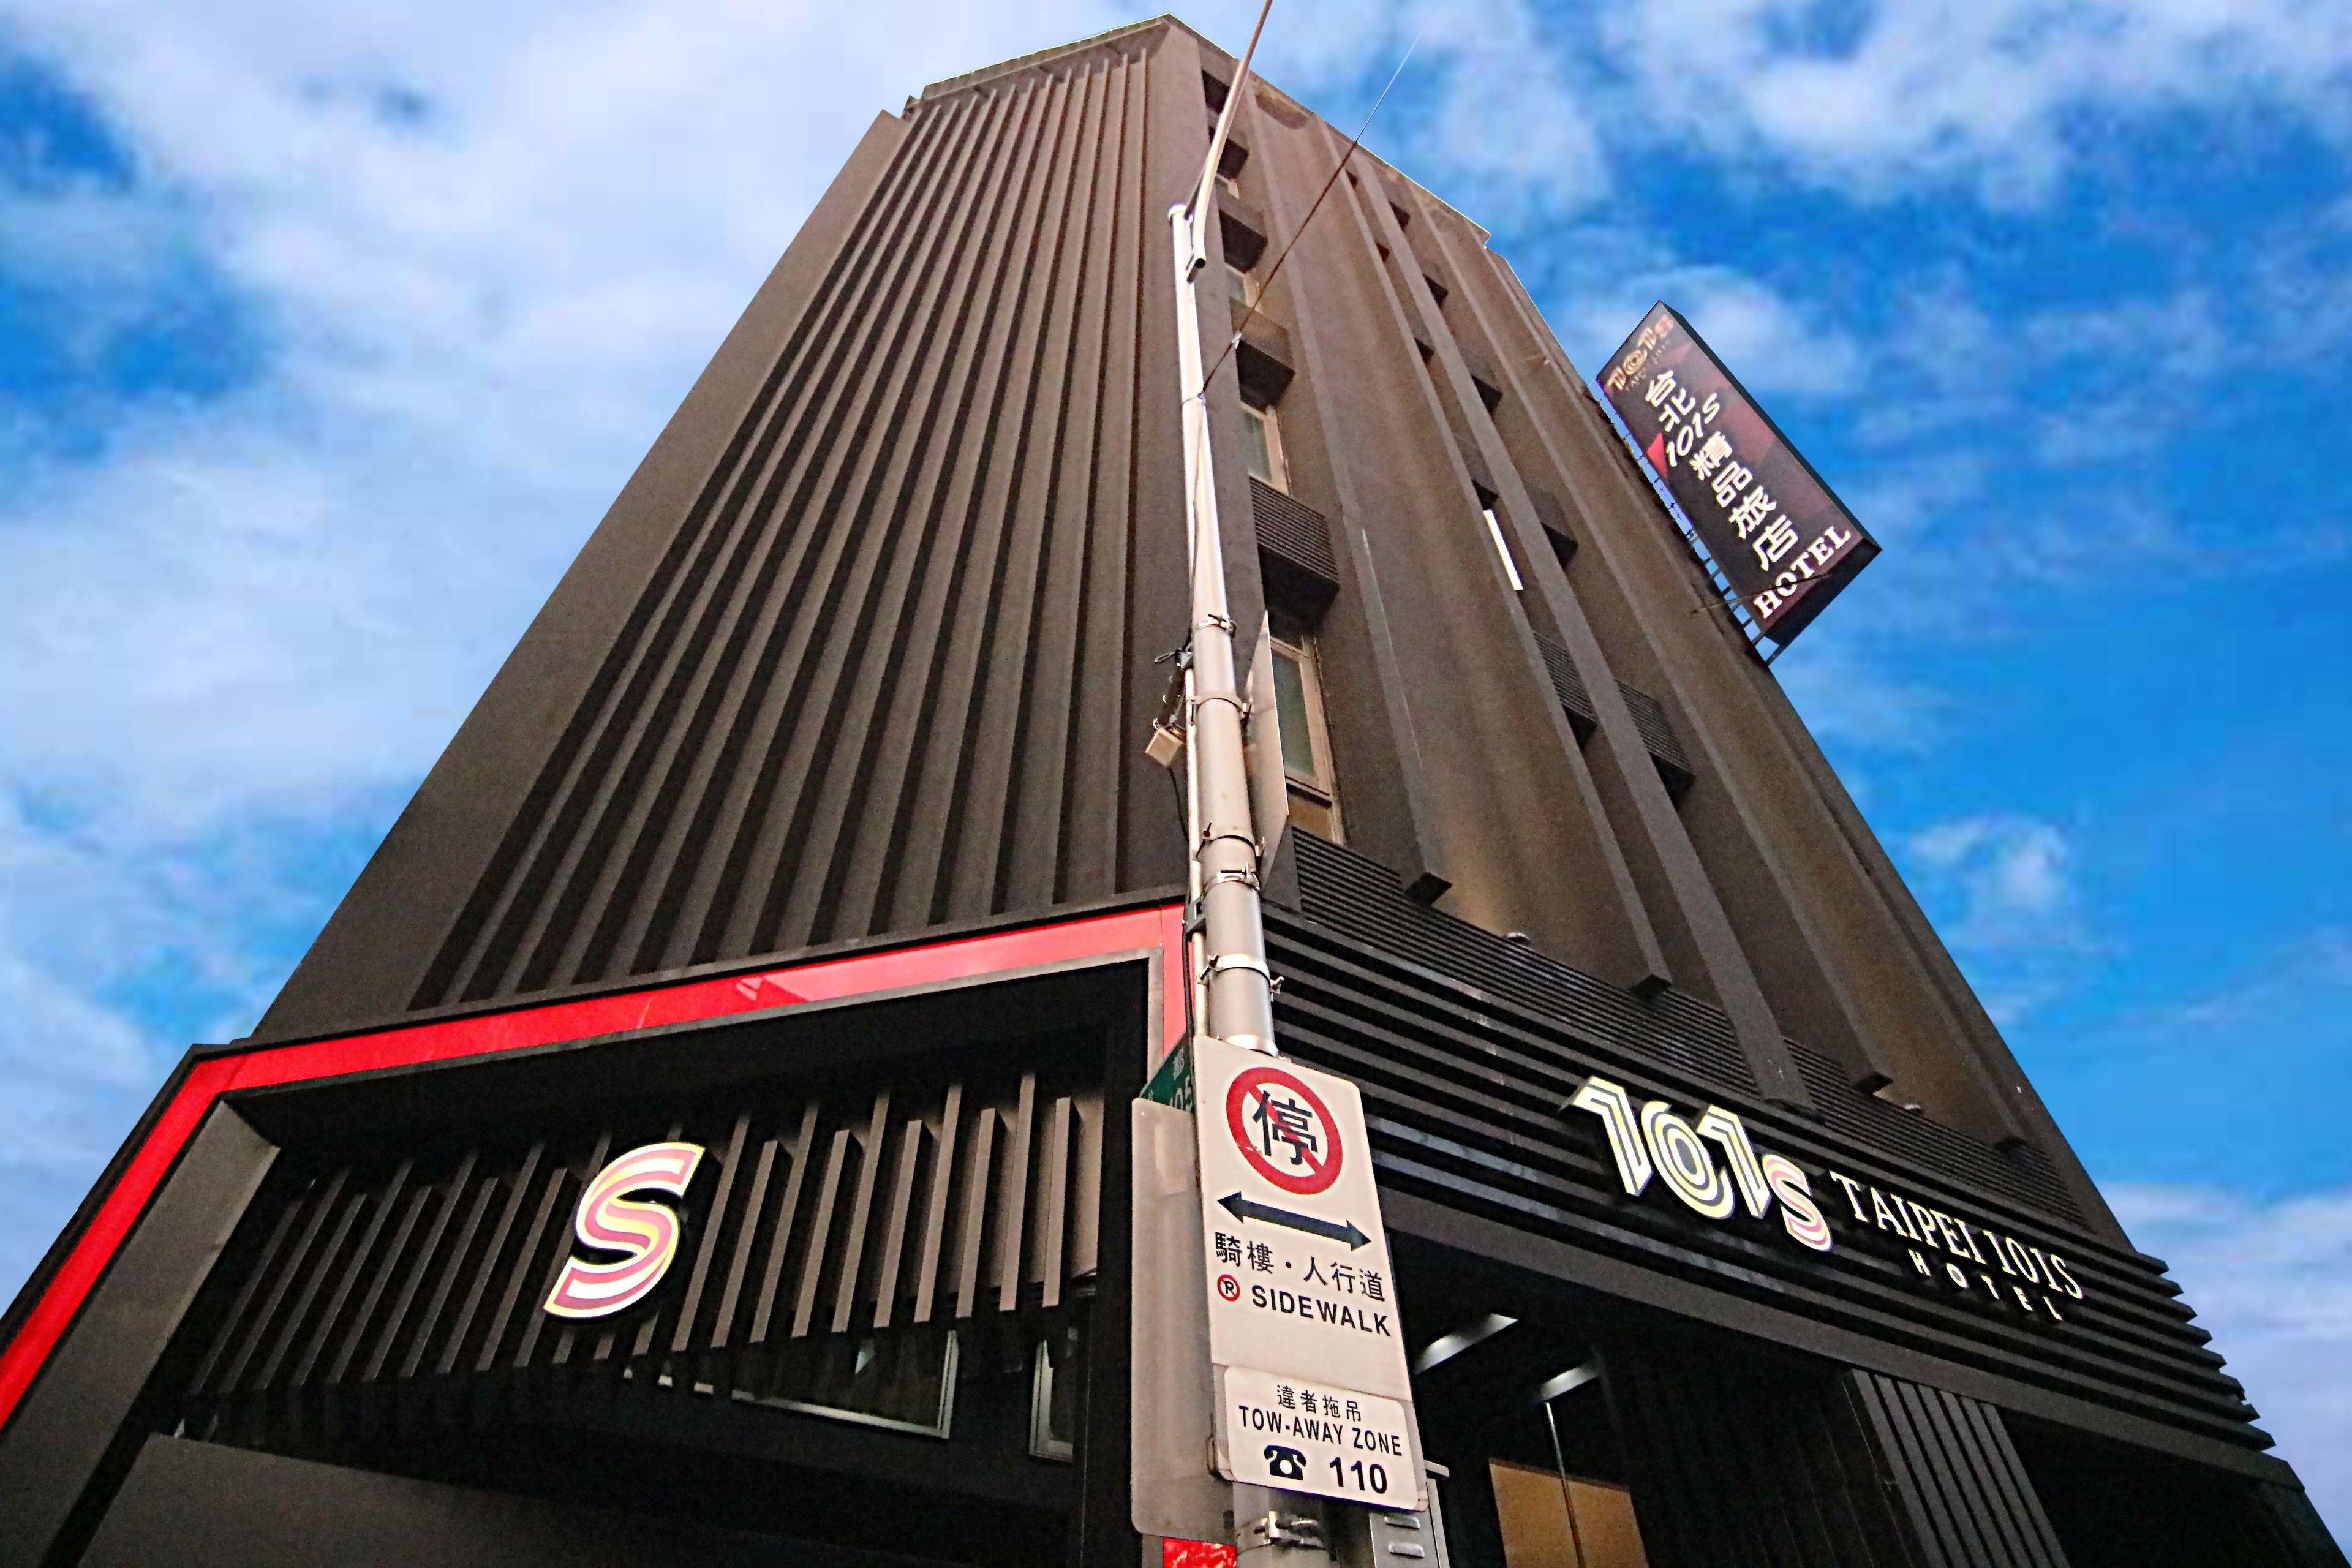 101-s Hotel